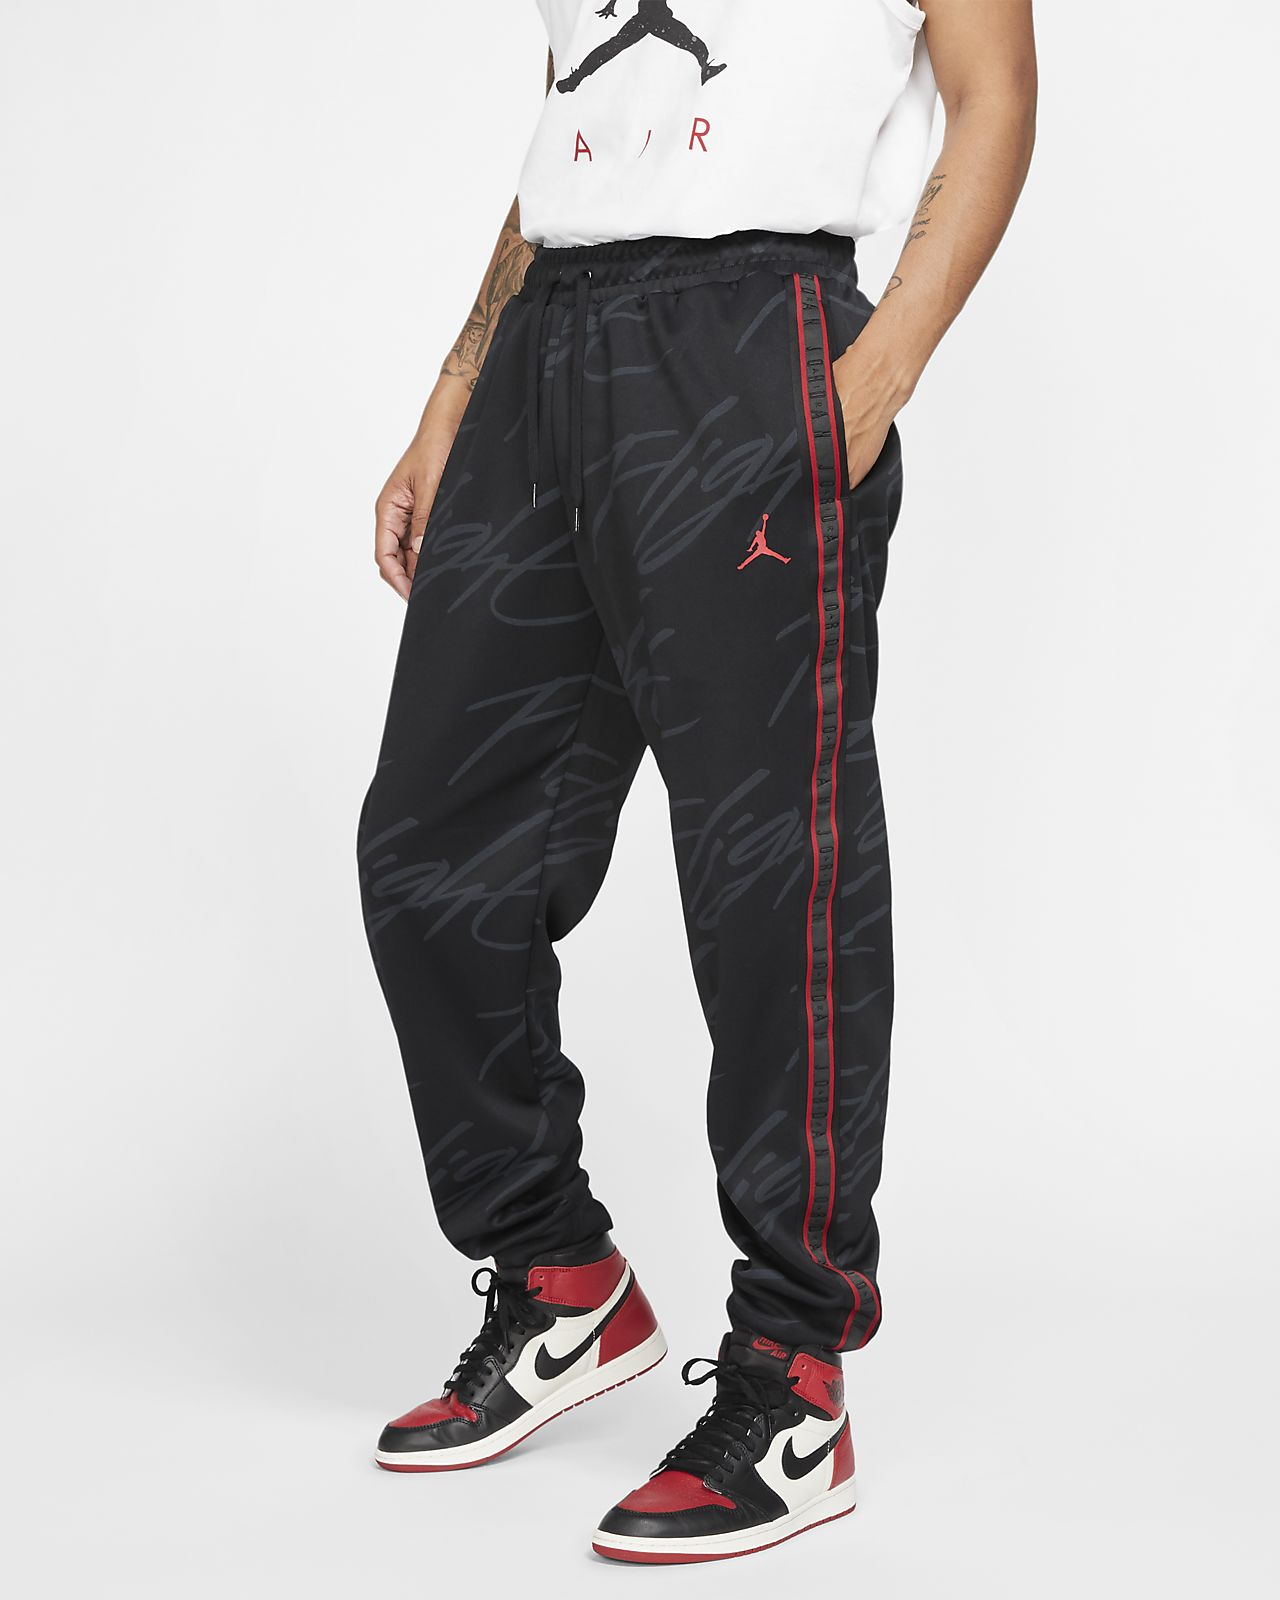 e52c95e24c1910 Low Resolution Jordan Jumpman Tricot Graphic Pants Jordan Jumpman Tricot  Graphic Pants